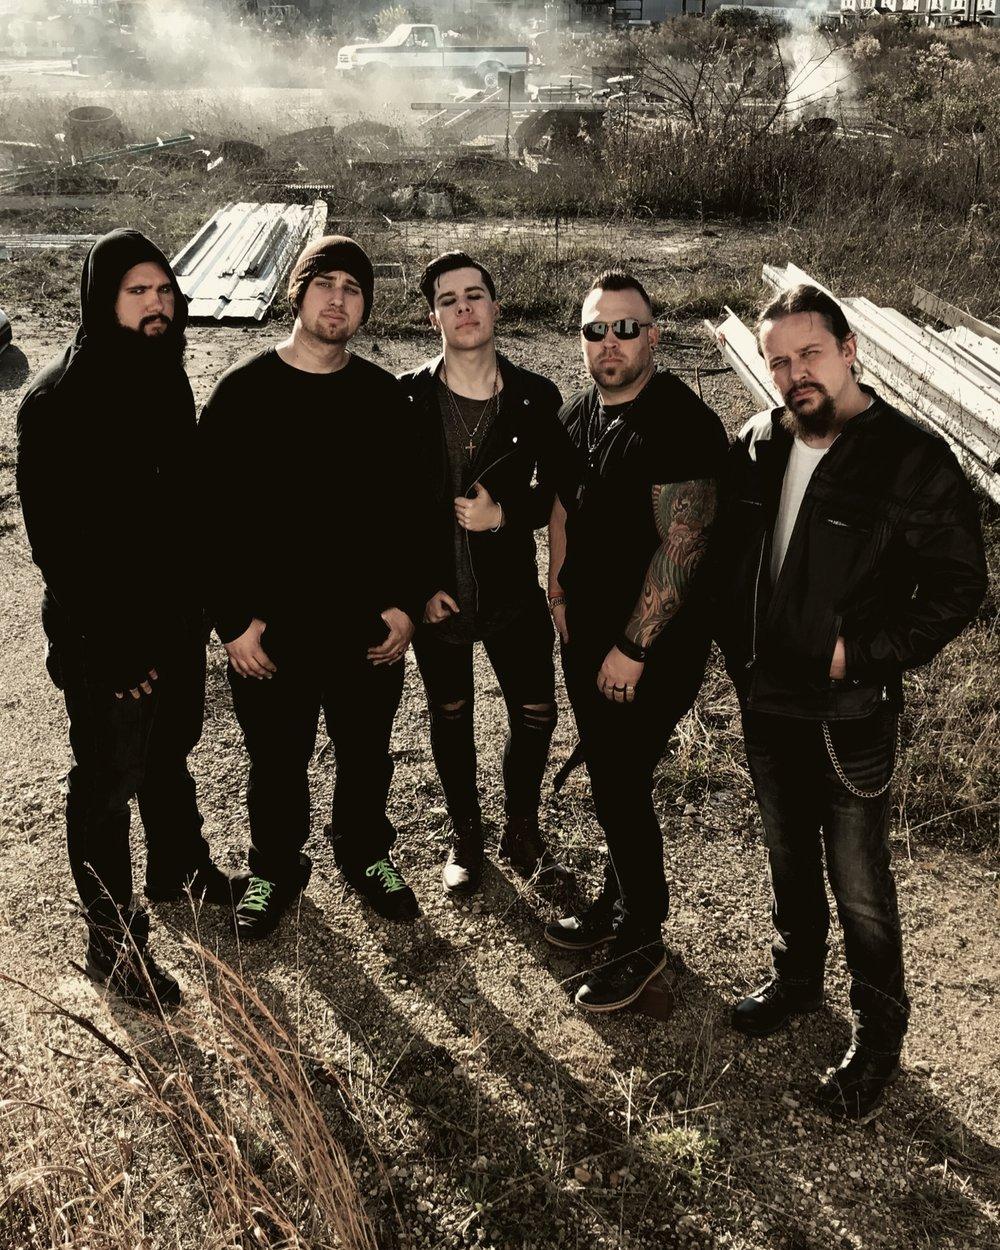 Josh, Levi, Caleb, Scott, Tony